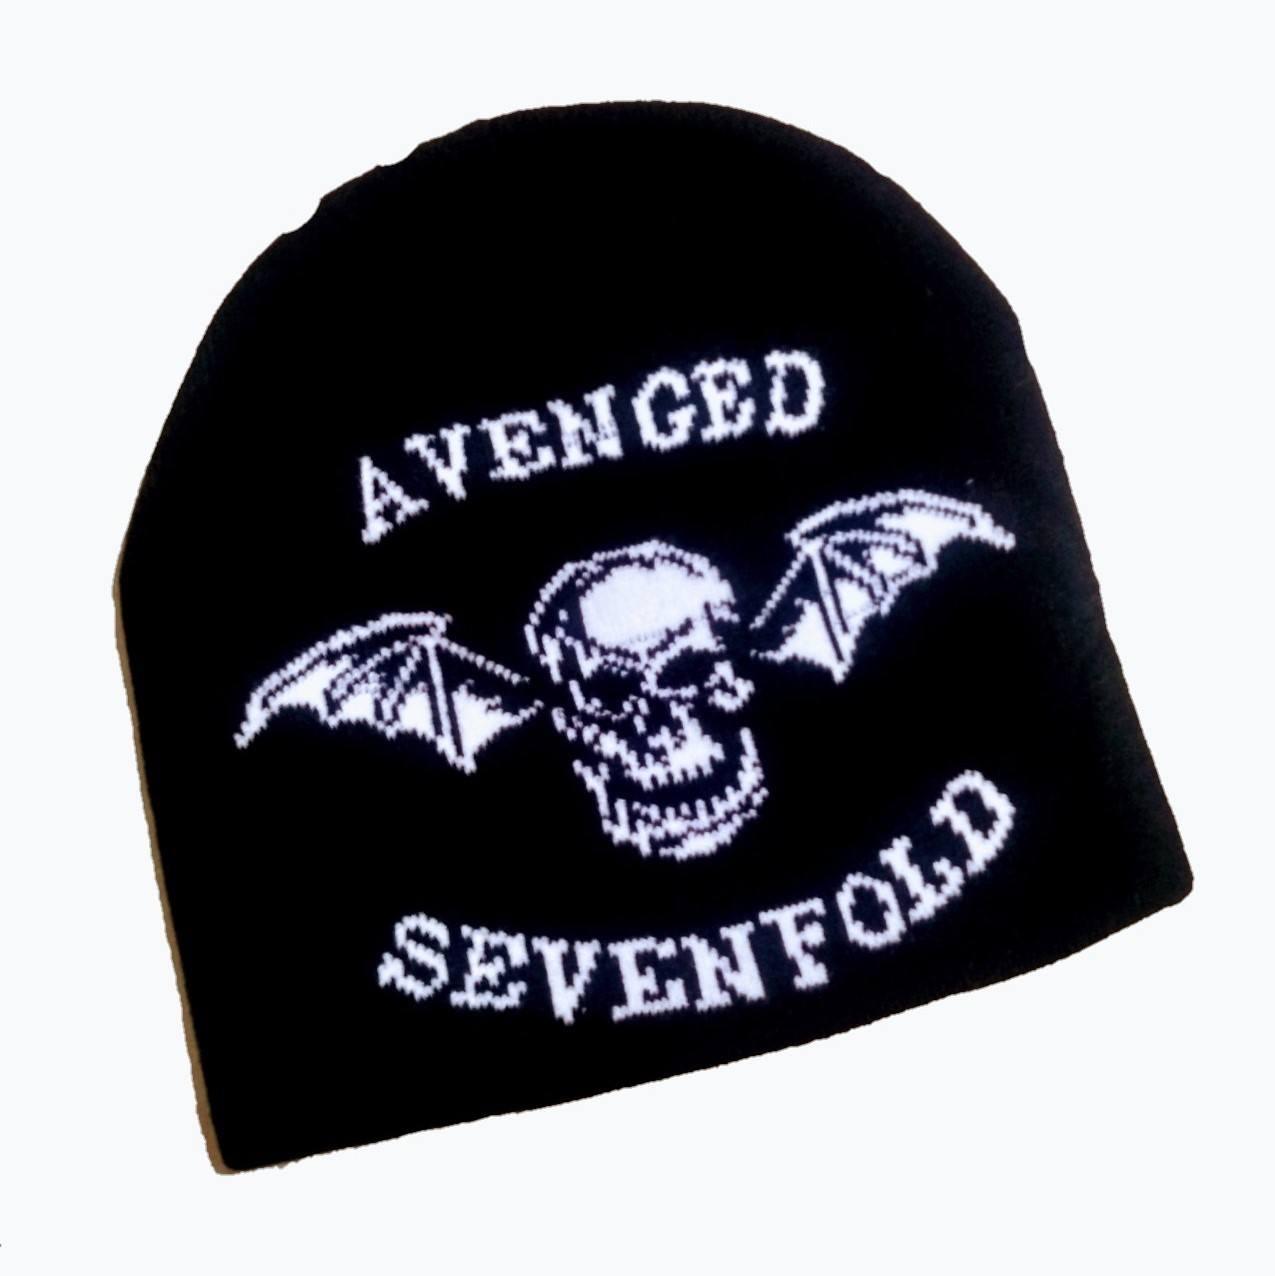 Gorro de lã unissex Avenged Sevenfold